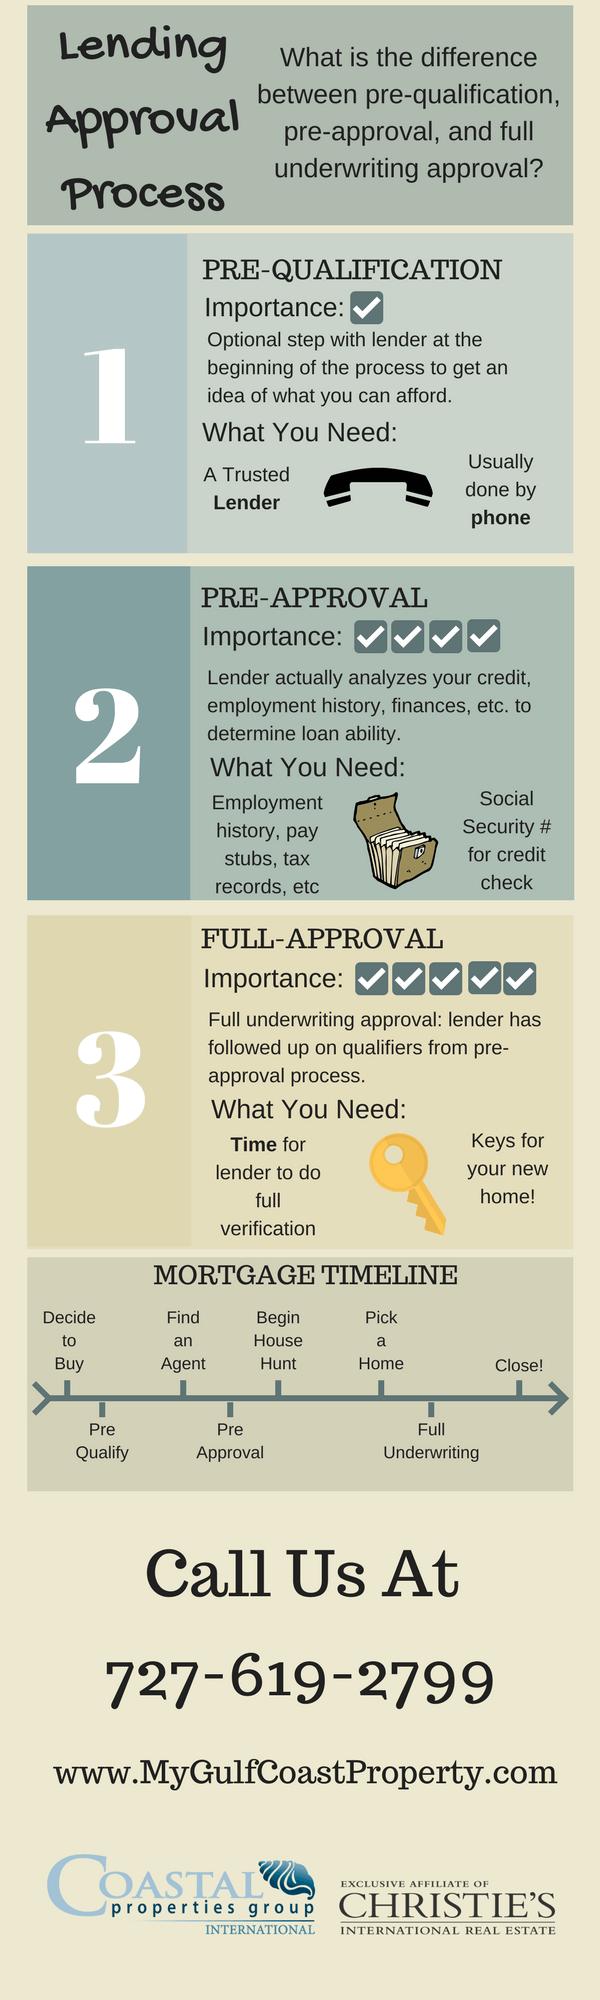 Lending Approval Process